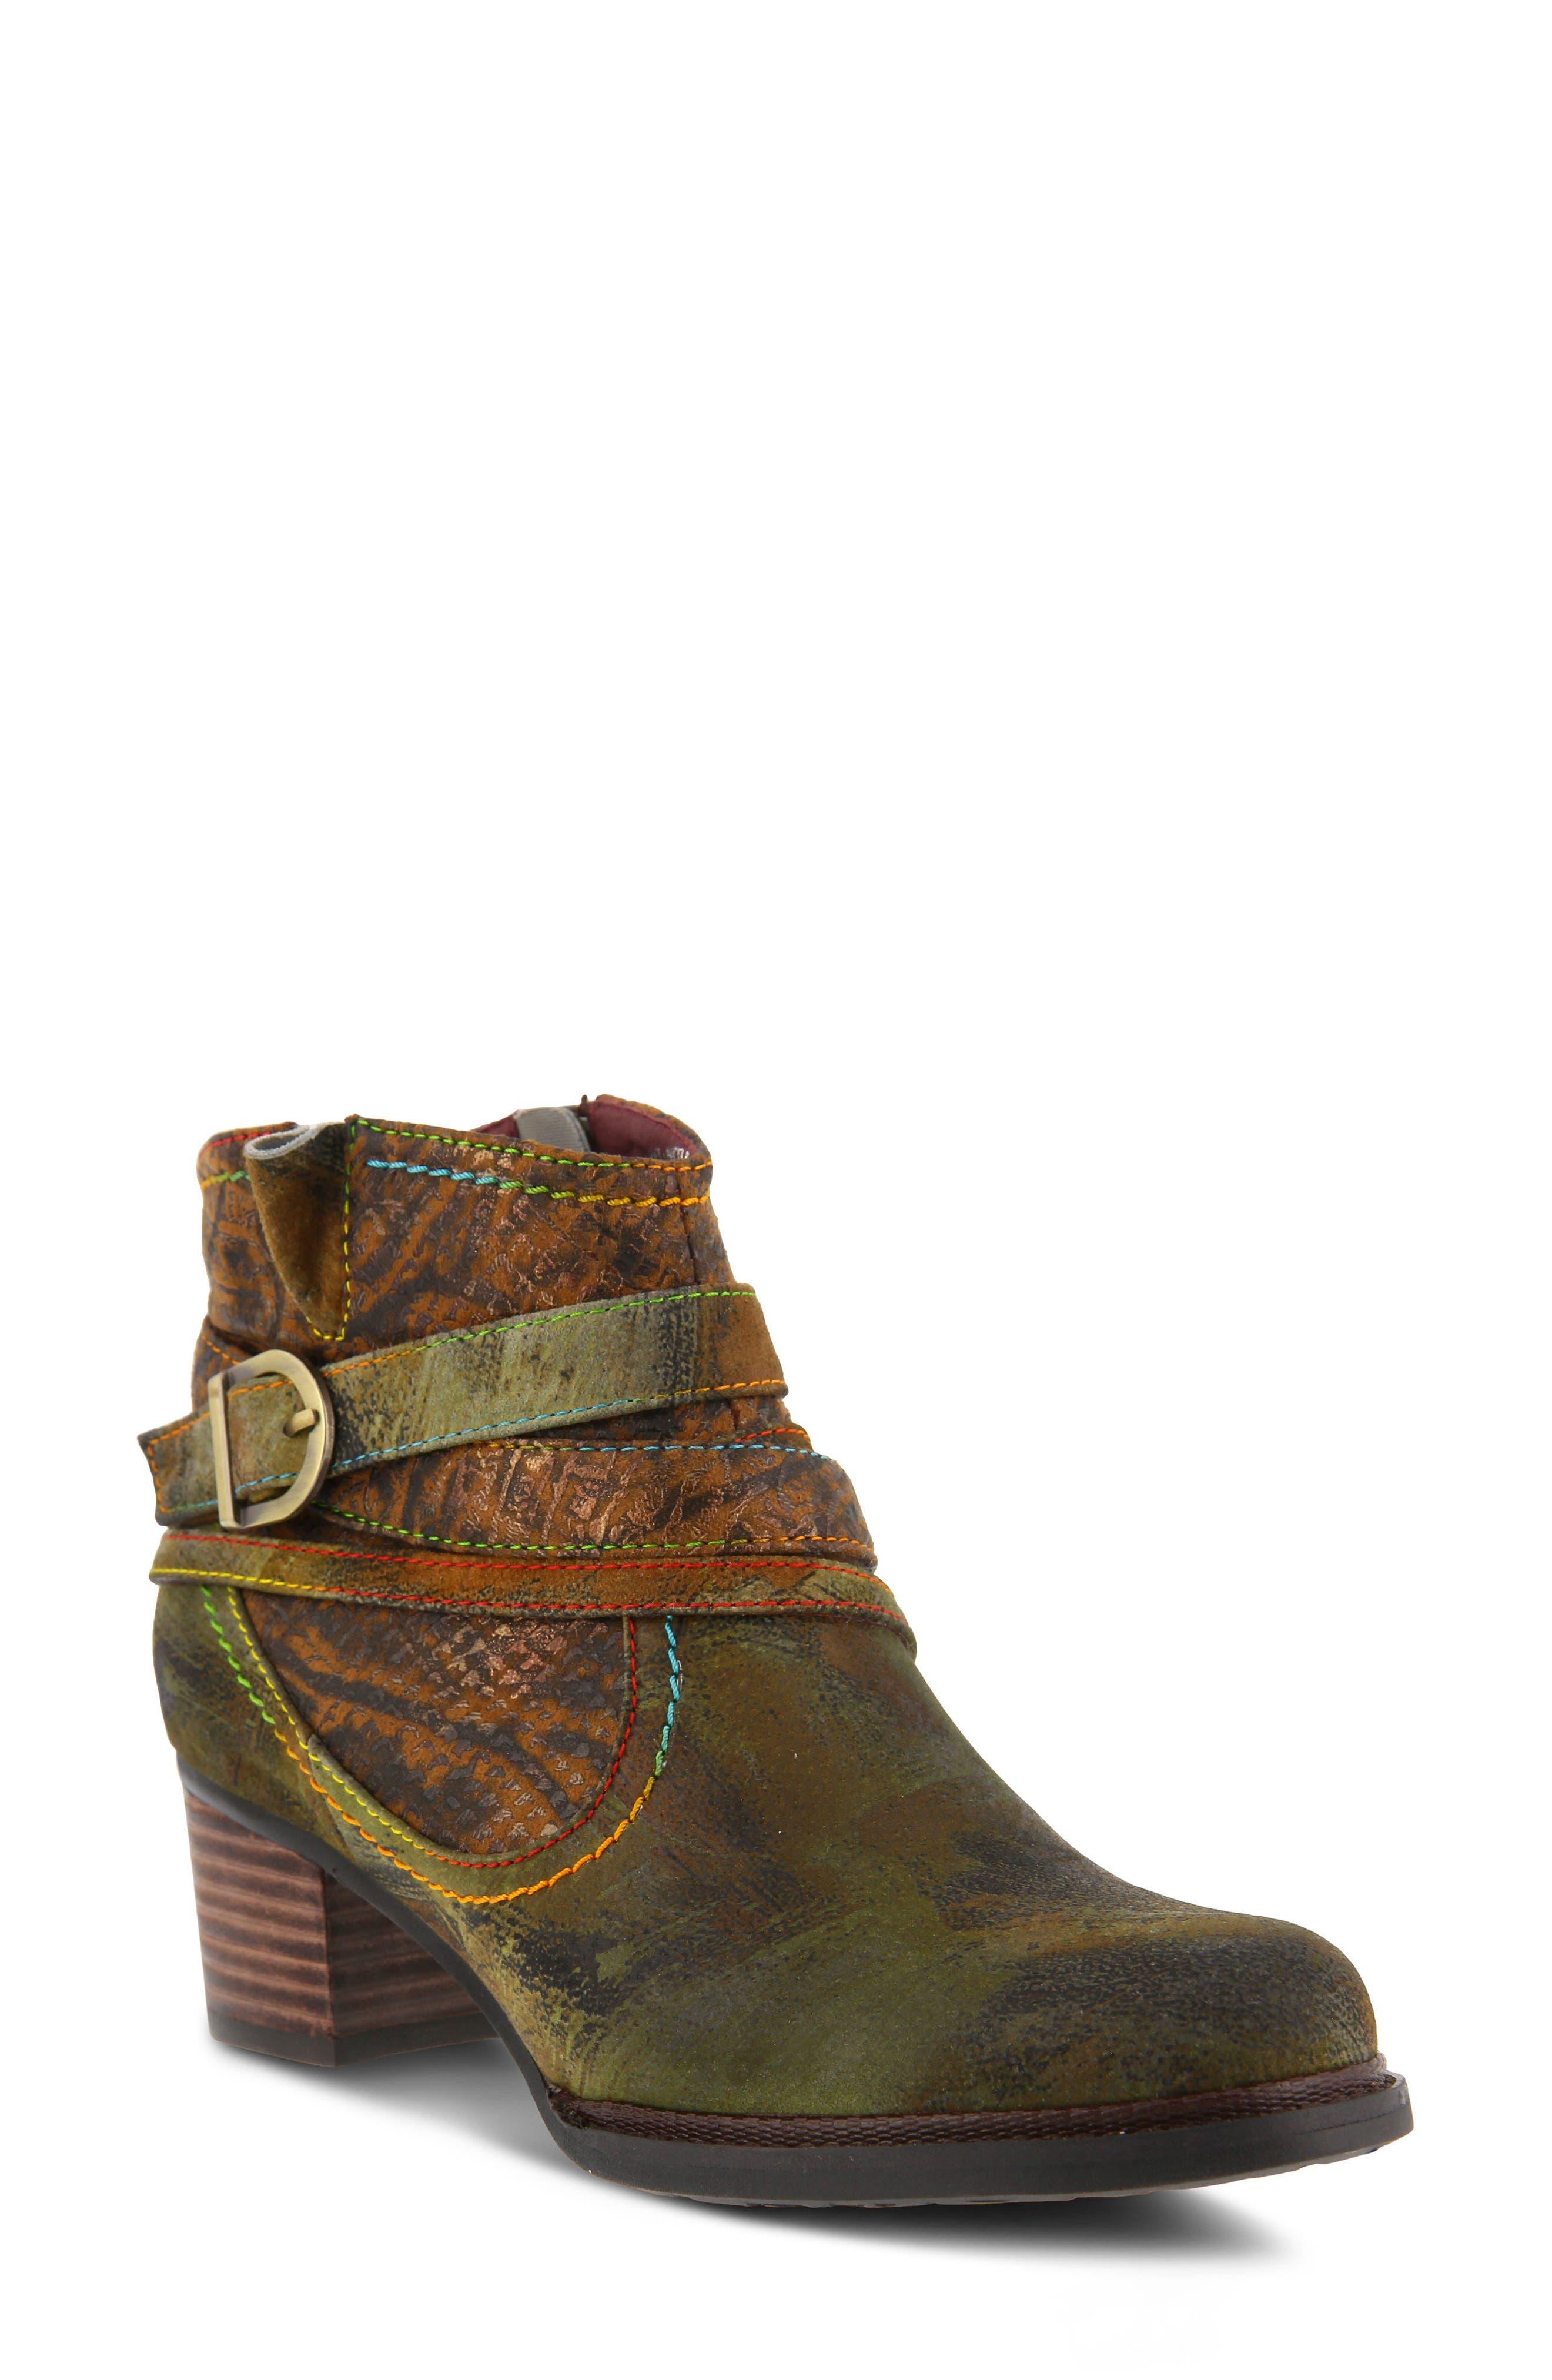 L'Artiste Shazzam Boot,                         Main,                         color, CAMEL LEATHER